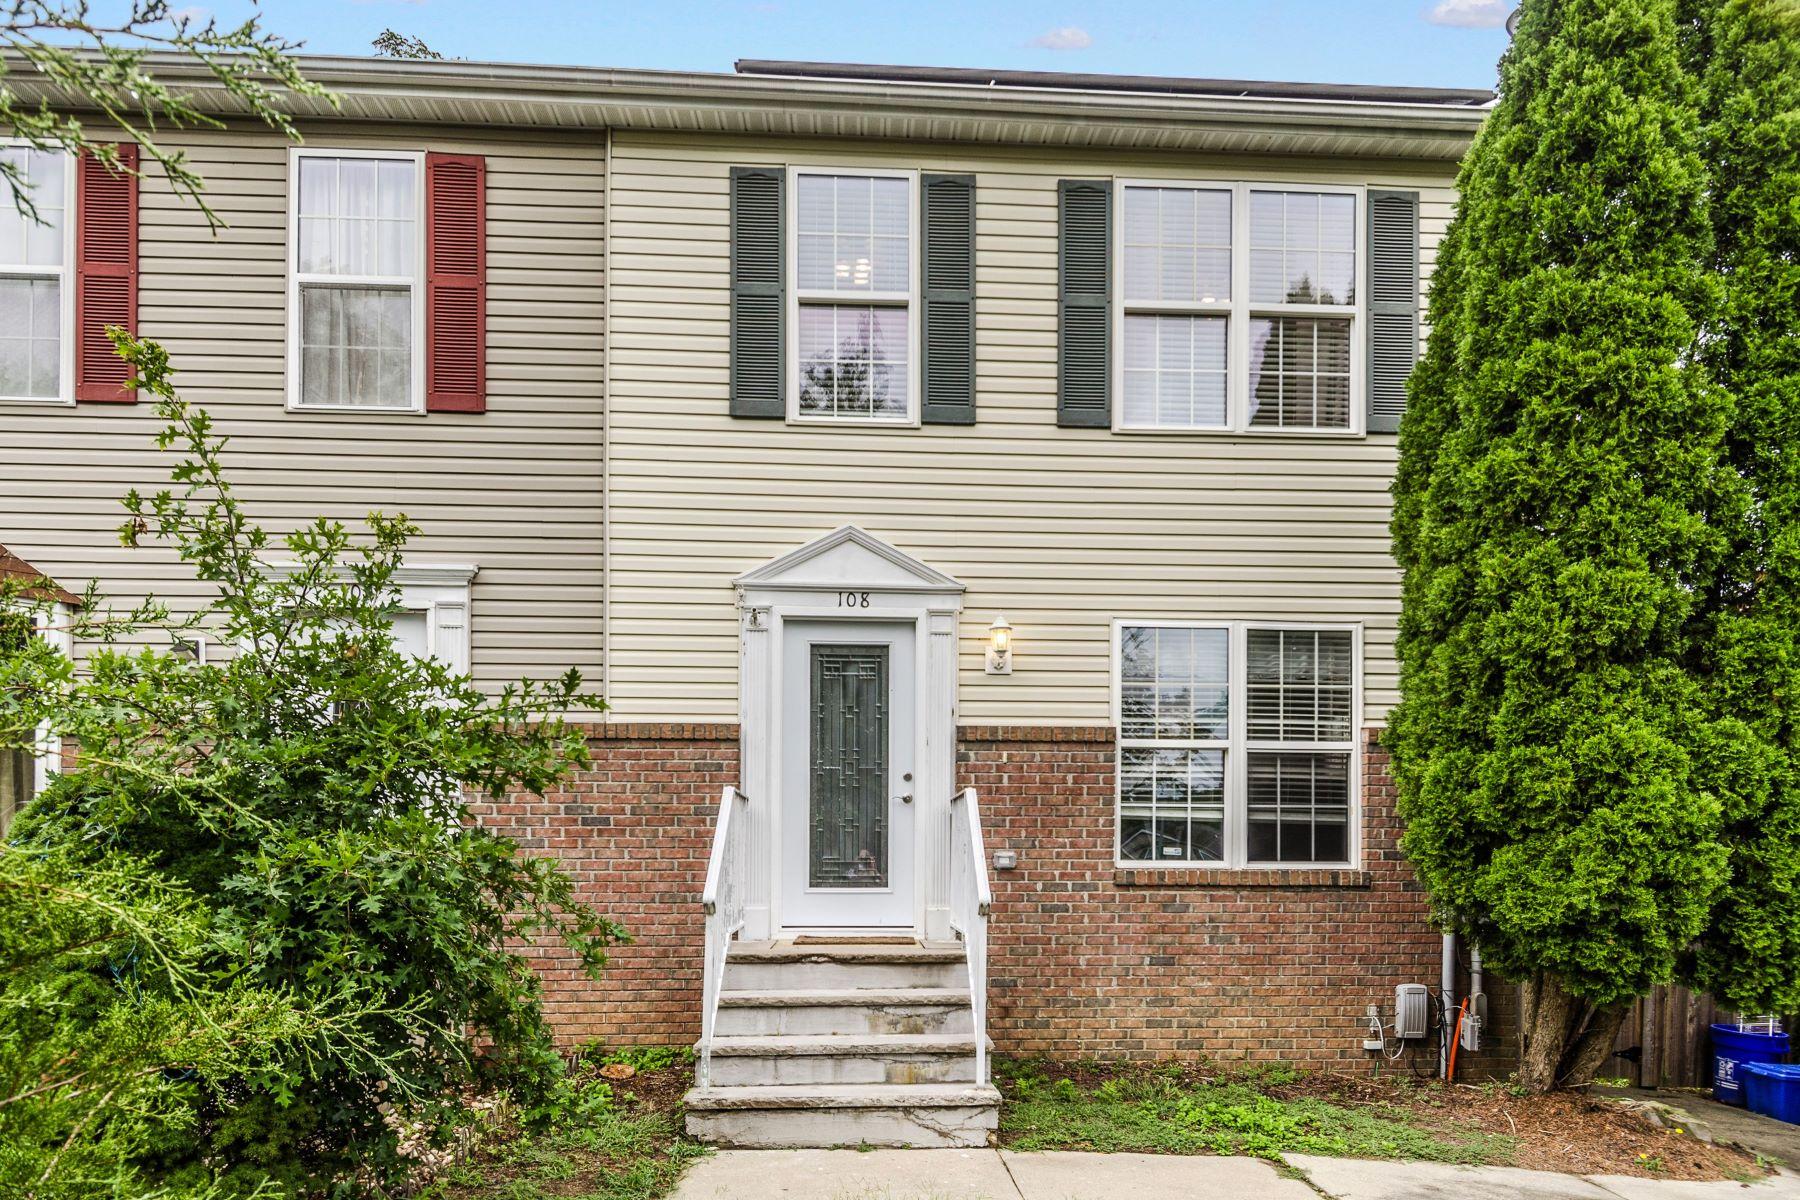 townhouses για την Πώληση στο Updated and Pretty as a Picture in Jamesburg 108 Mendoker Drive, Jamesburg, Νιου Τζερσεϋ 08831 Ηνωμένες Πολιτείες